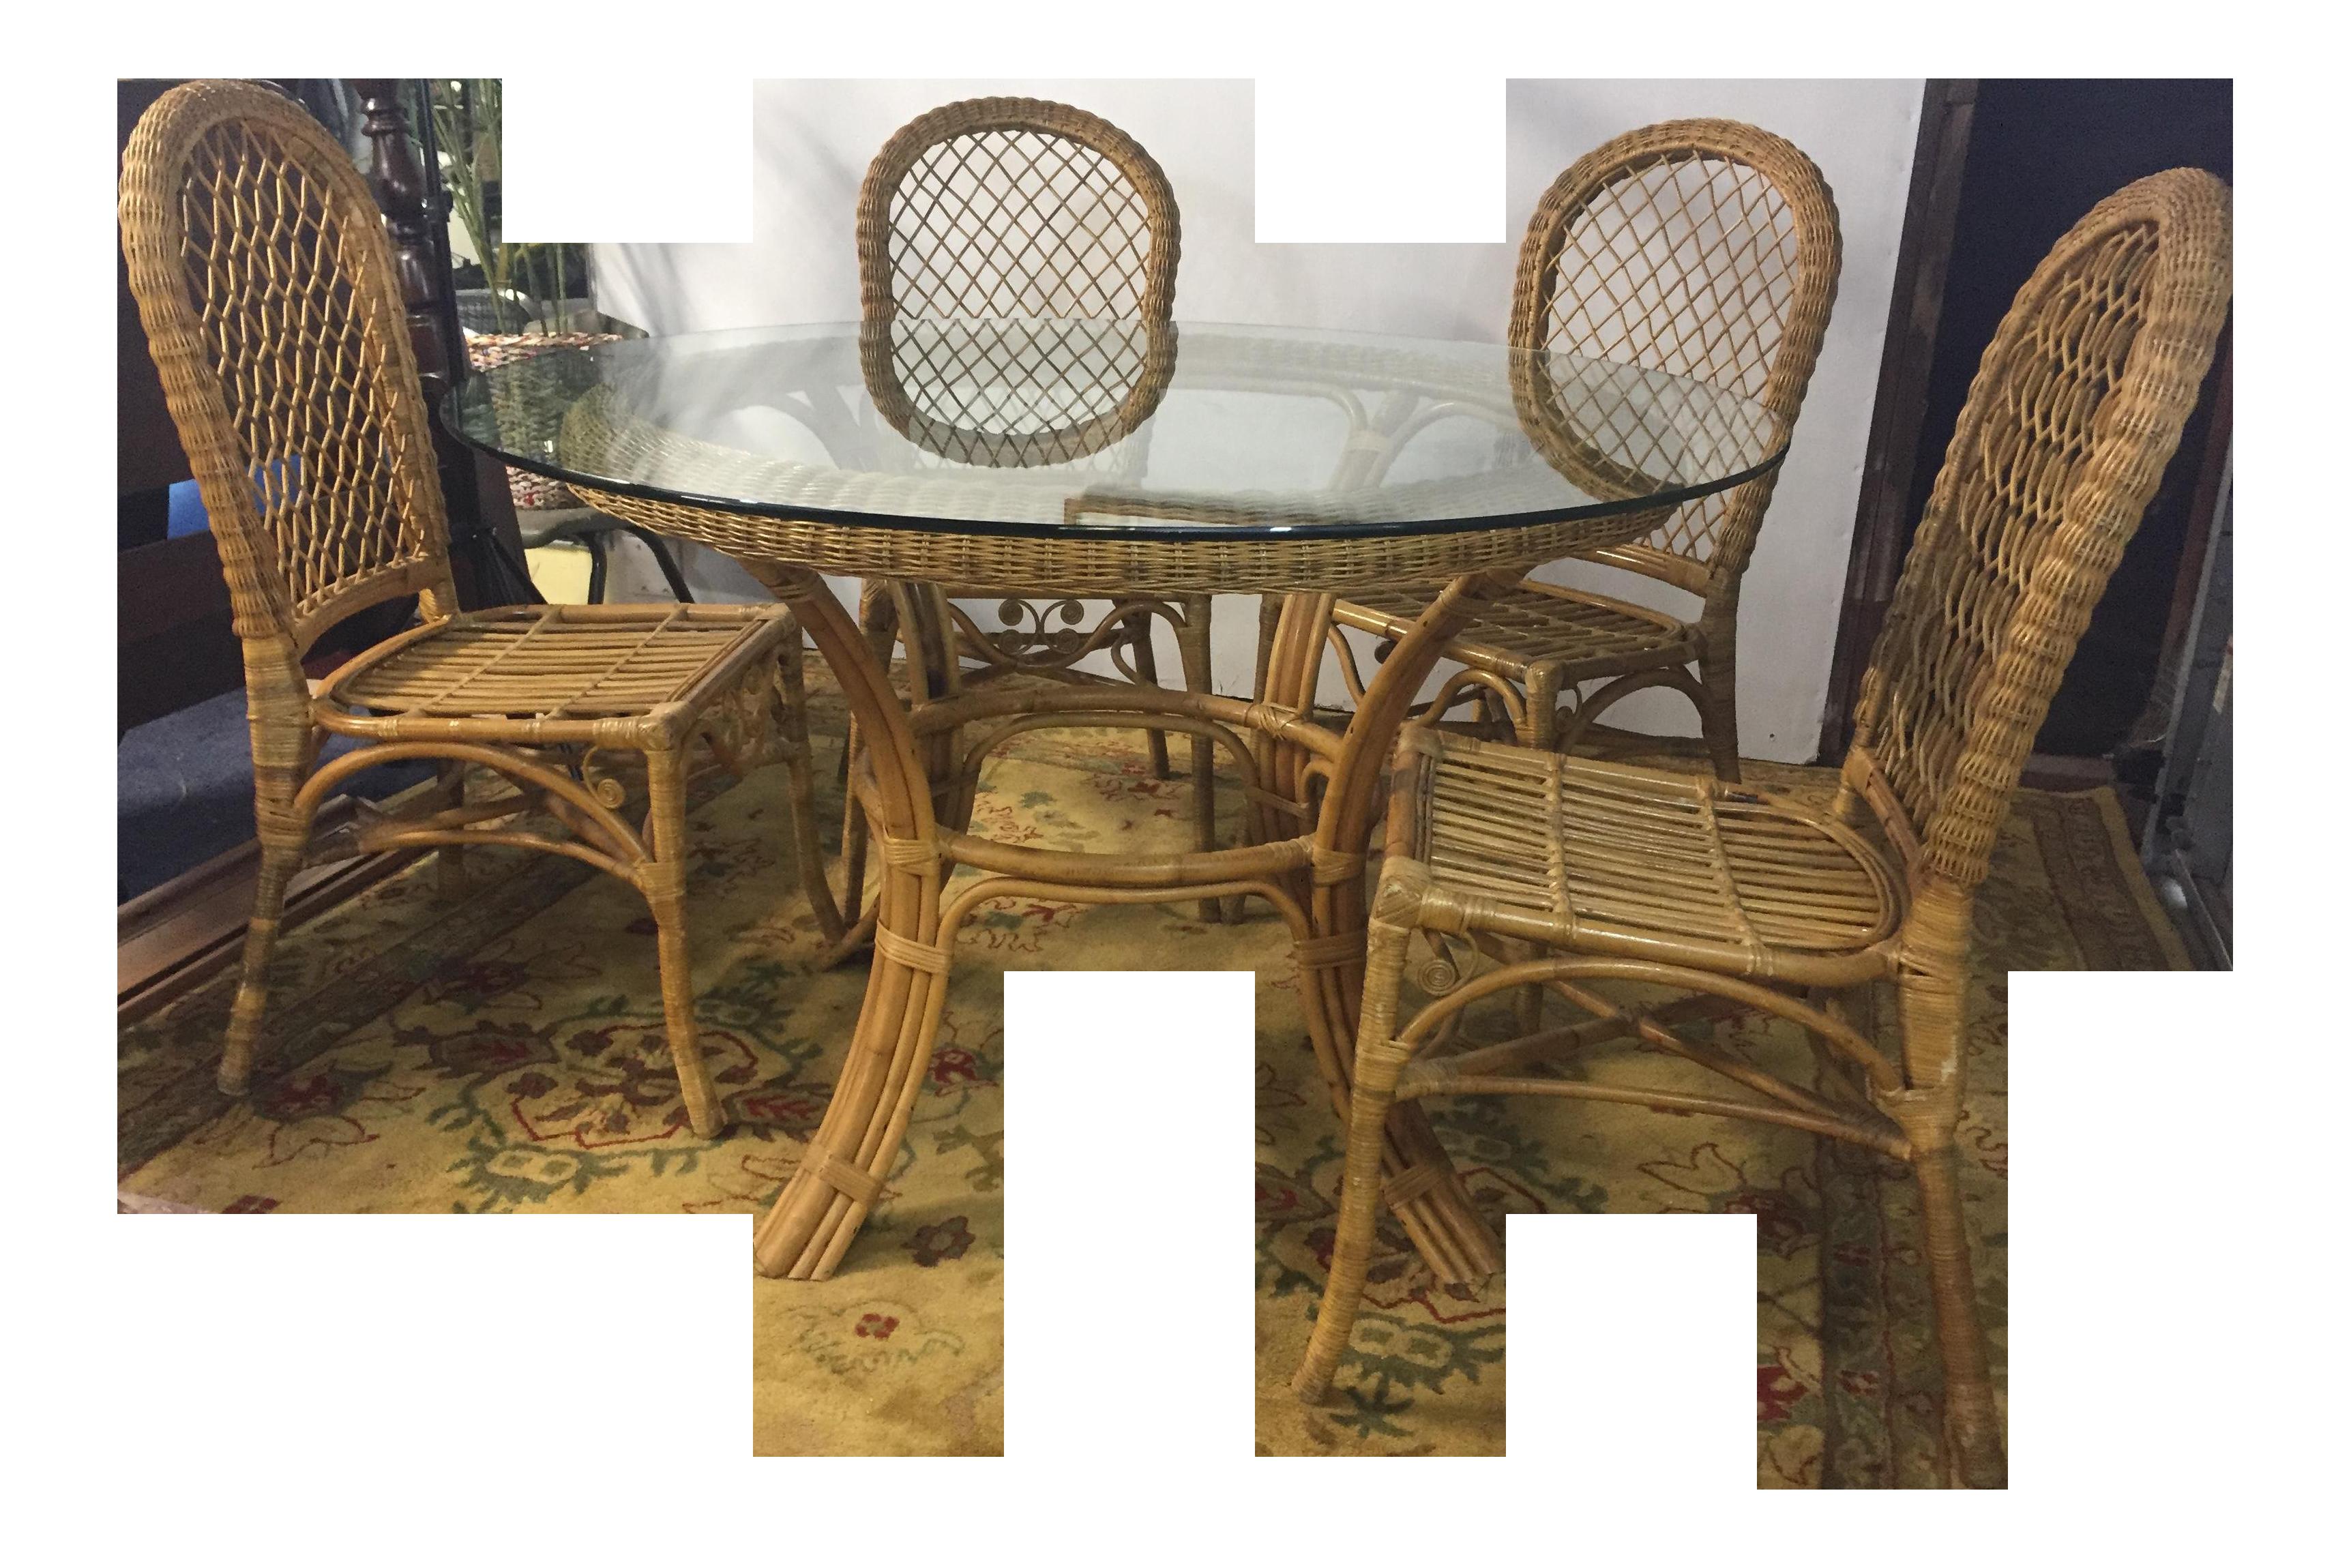 Beau Vintage Rattan Bamboo Round Glass Dining Set